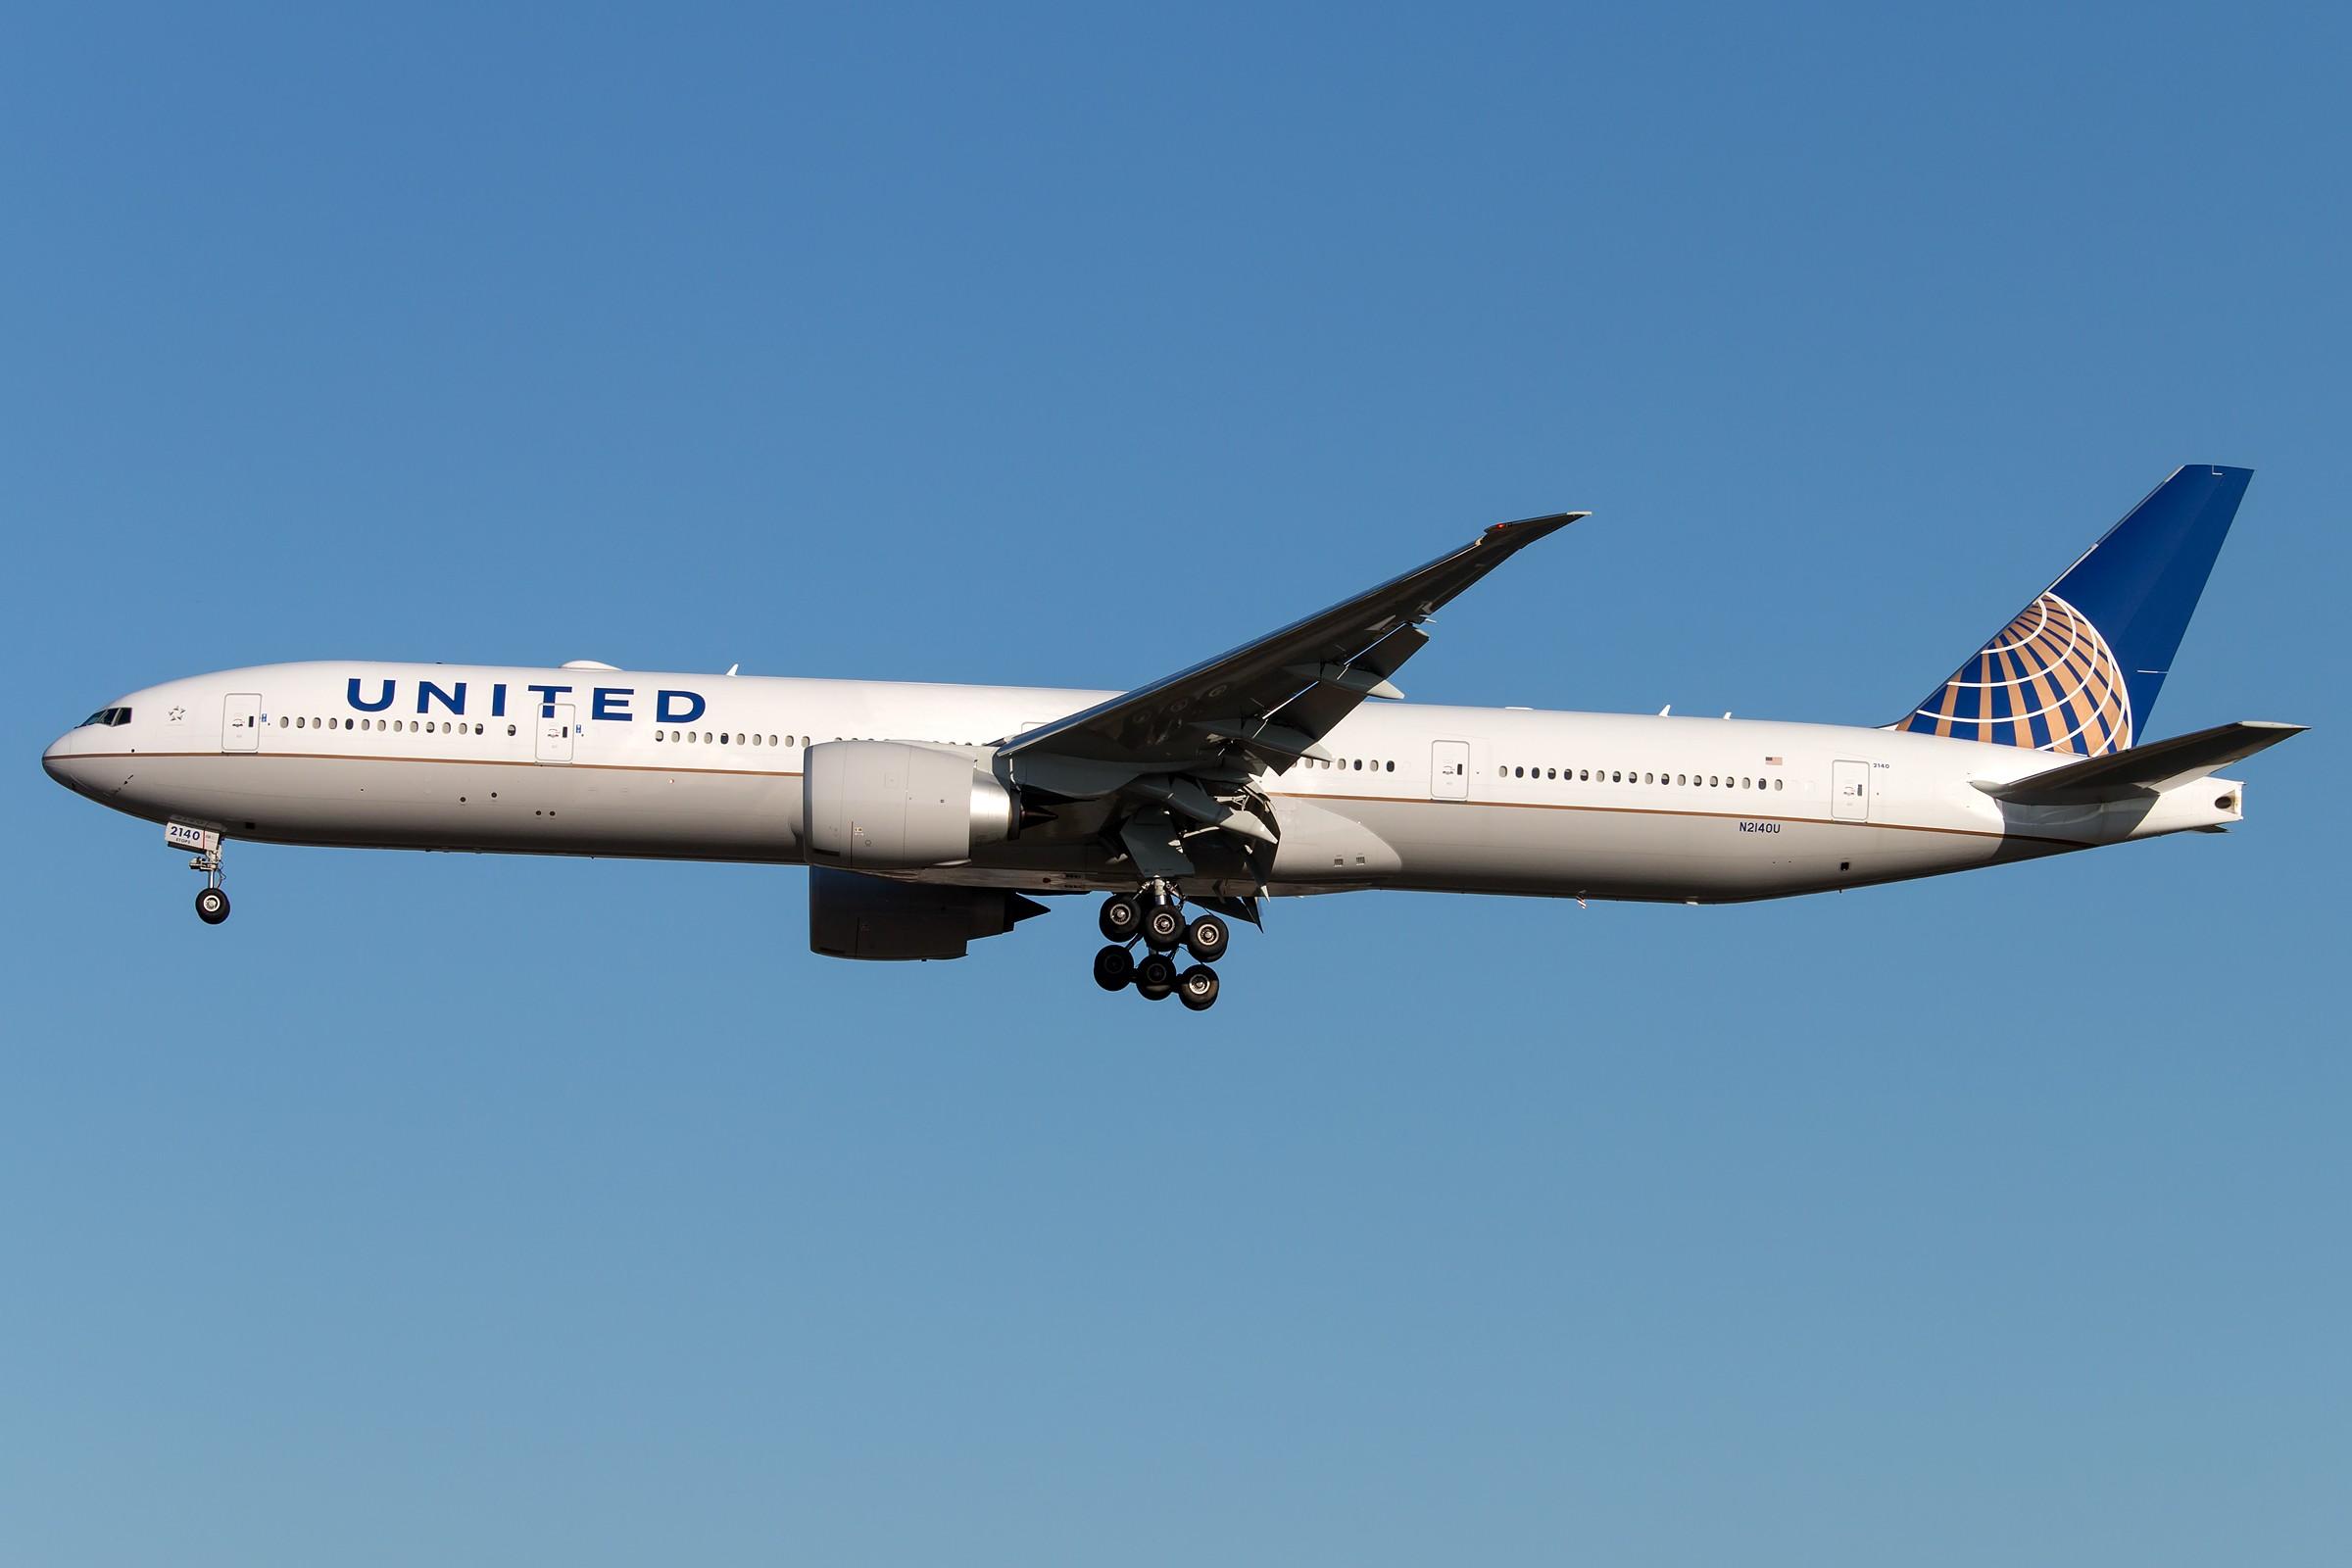 Re:[原创]杂图5张 BOEING 777-322(ER) N2140U 中国北京首都国际机场